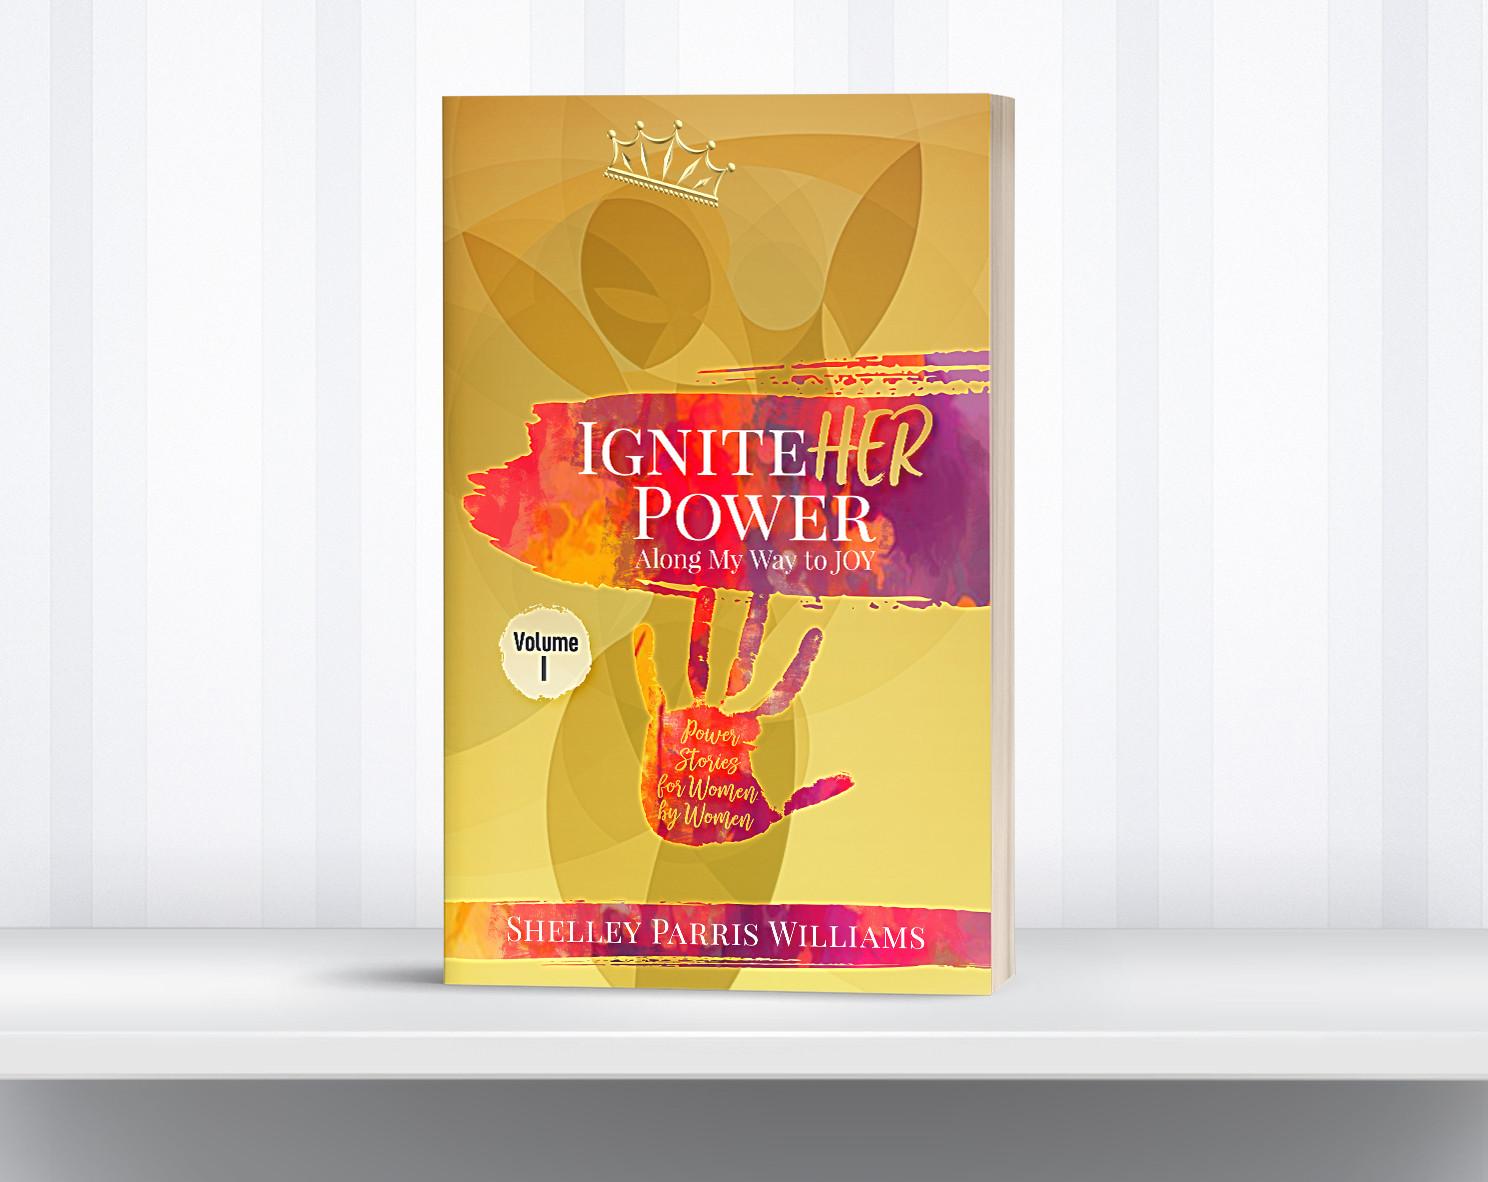 IgniteHER Power: Along My Way to JOY - Volume I.